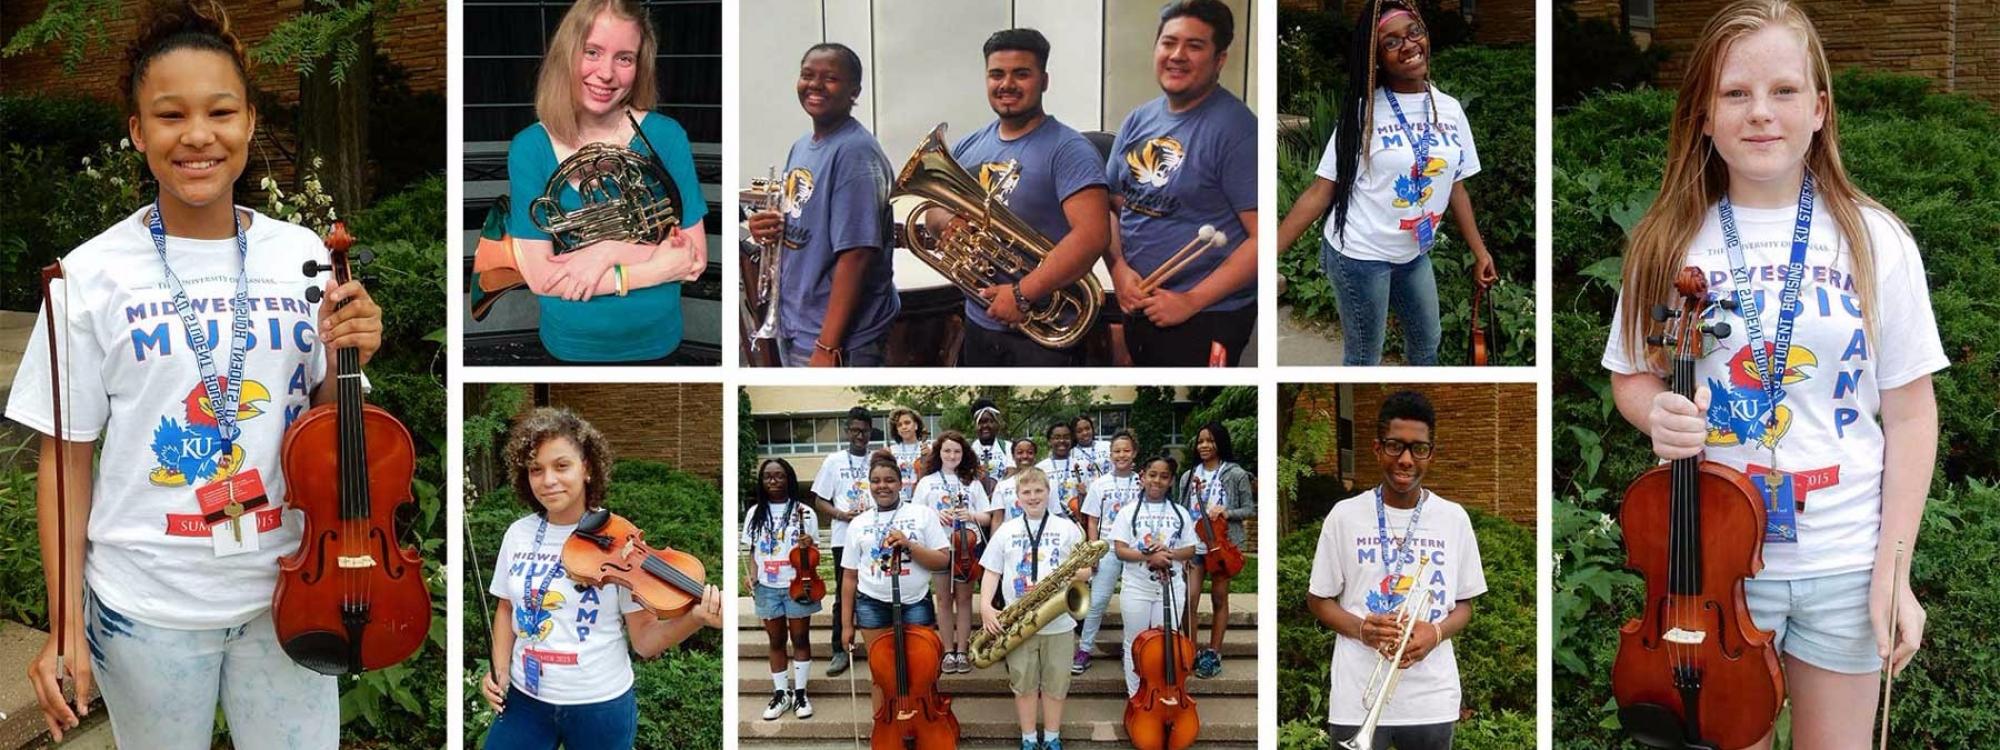 2015 Band of Angels Summer Band Camp Scholarship Recipients